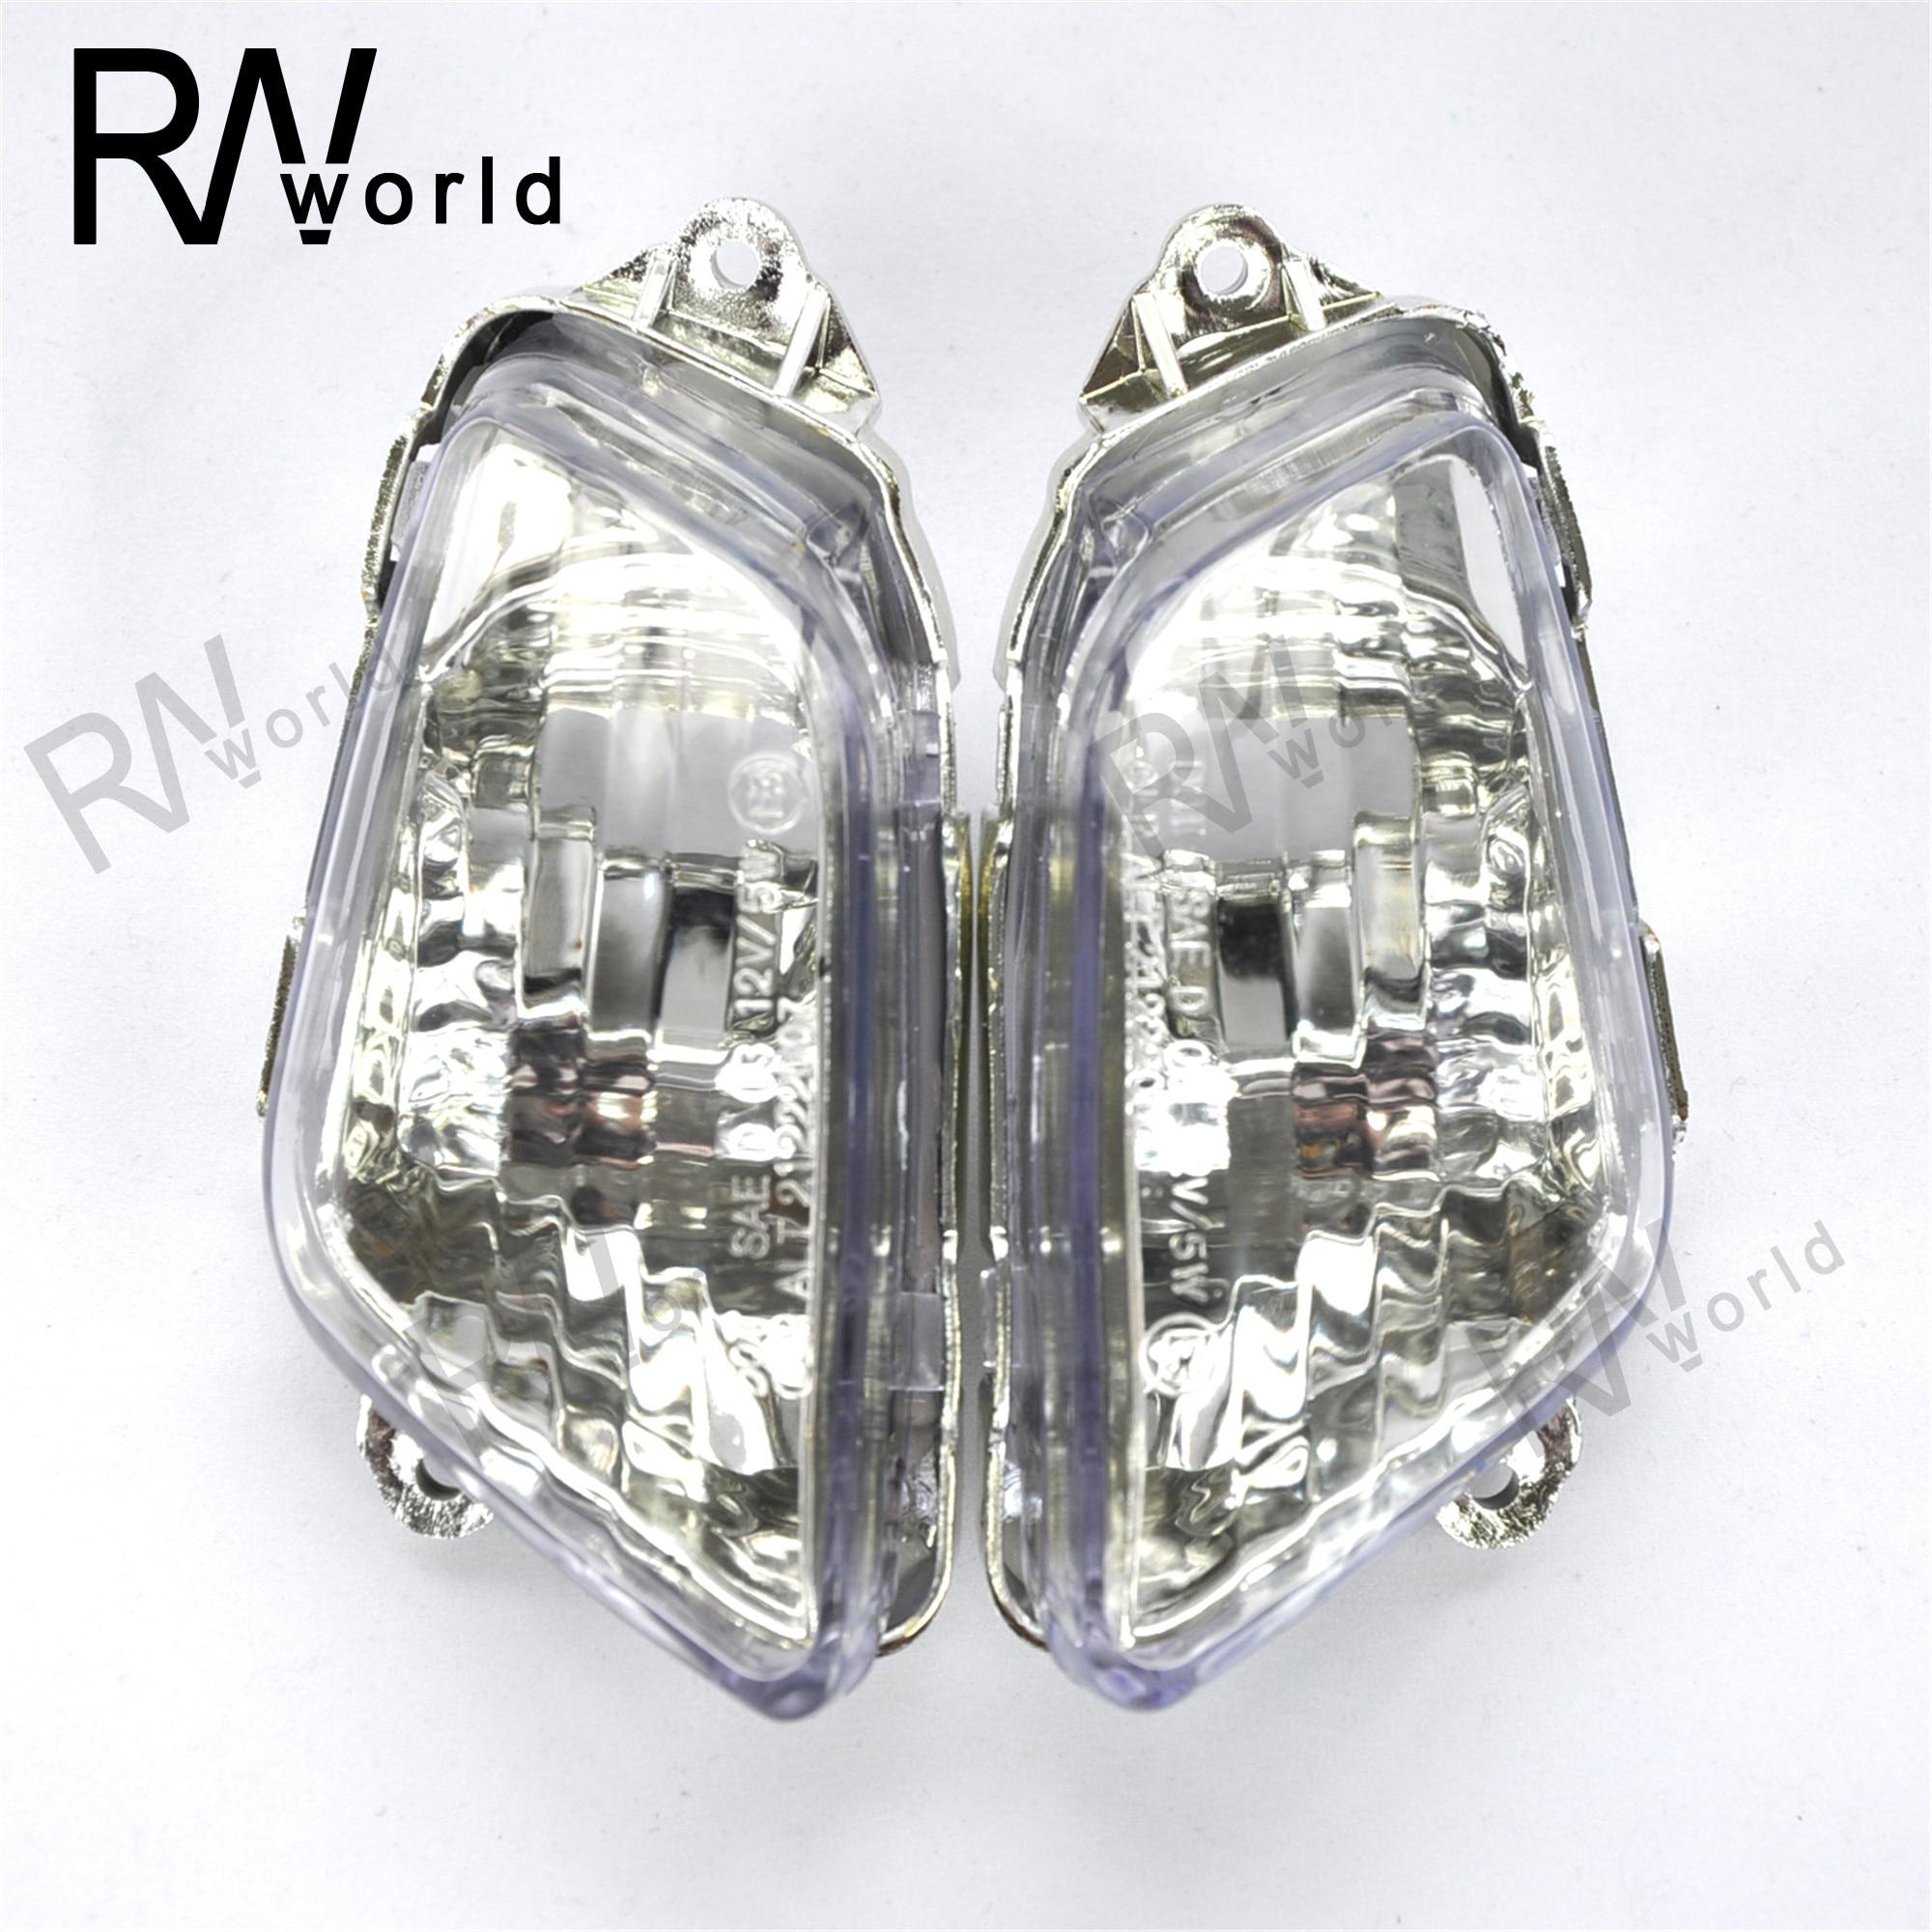 Motorcycle Front LED Turn Signal Lights Lens Covers For HONDA CBR1100XX CBR1100 XX CBR 1100XX 1997-2006 1998 00 01 02 03